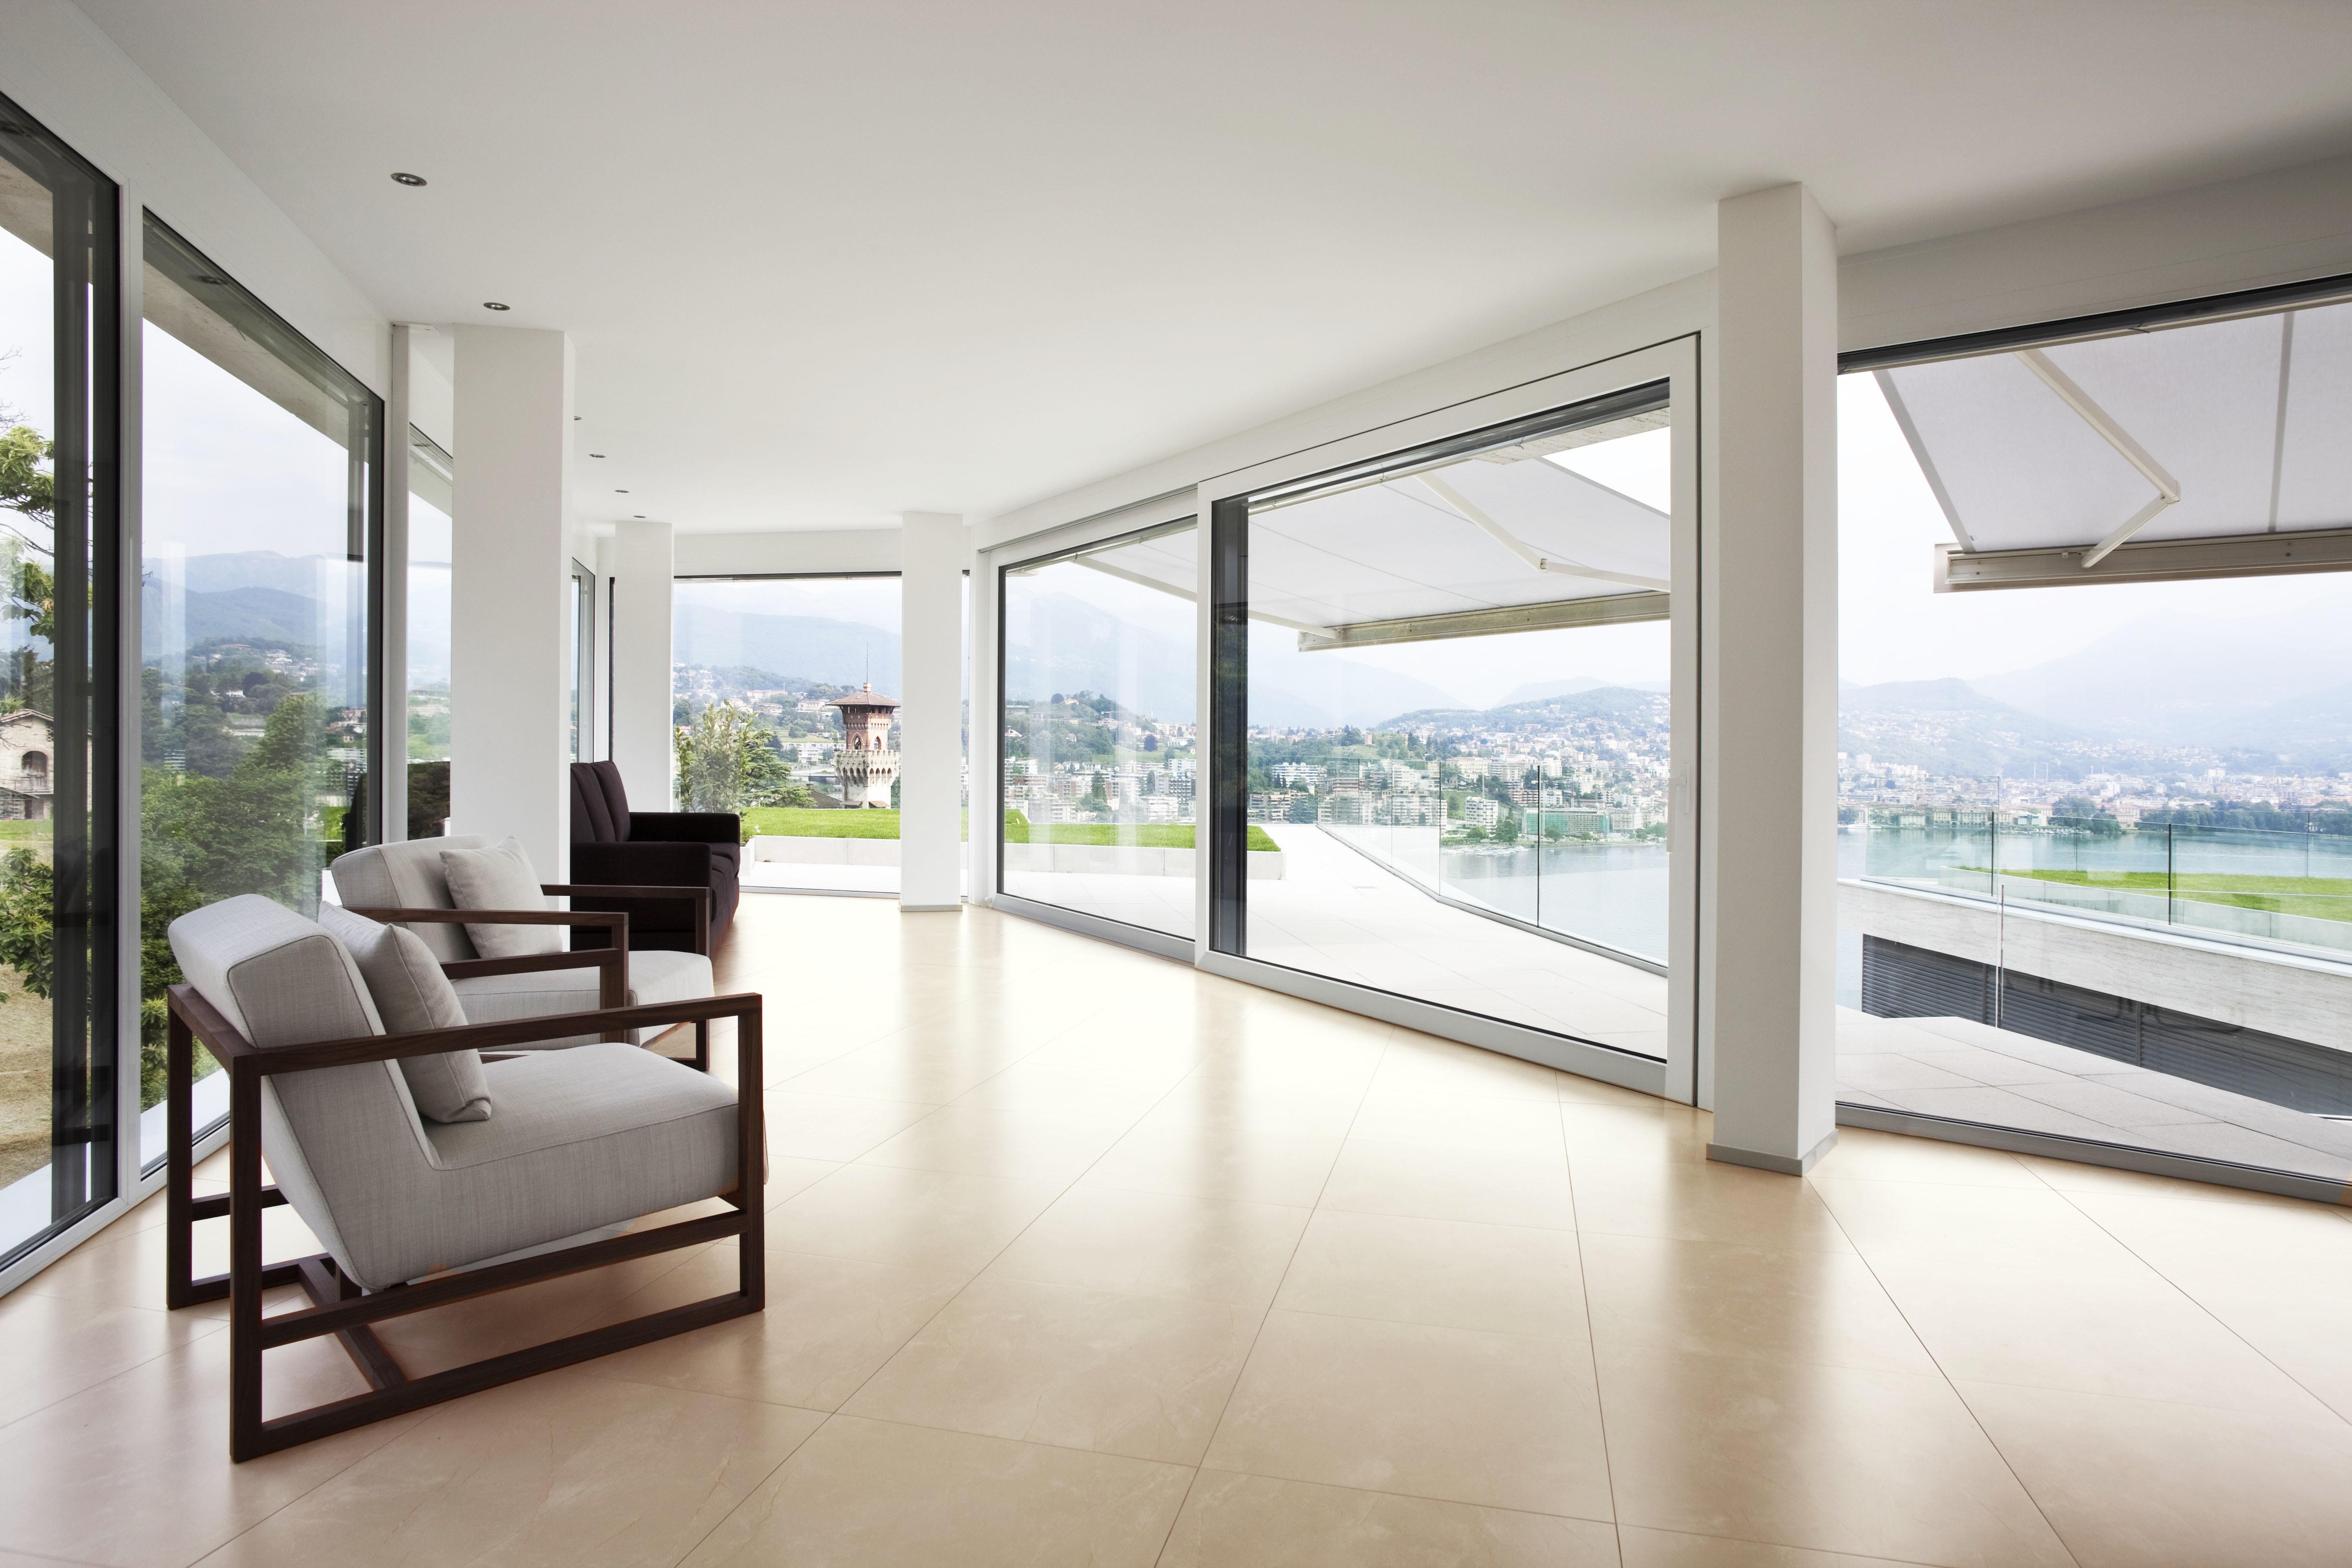 broadway fliesen feinsteinzeug fliesen granitfliesen. Black Bedroom Furniture Sets. Home Design Ideas